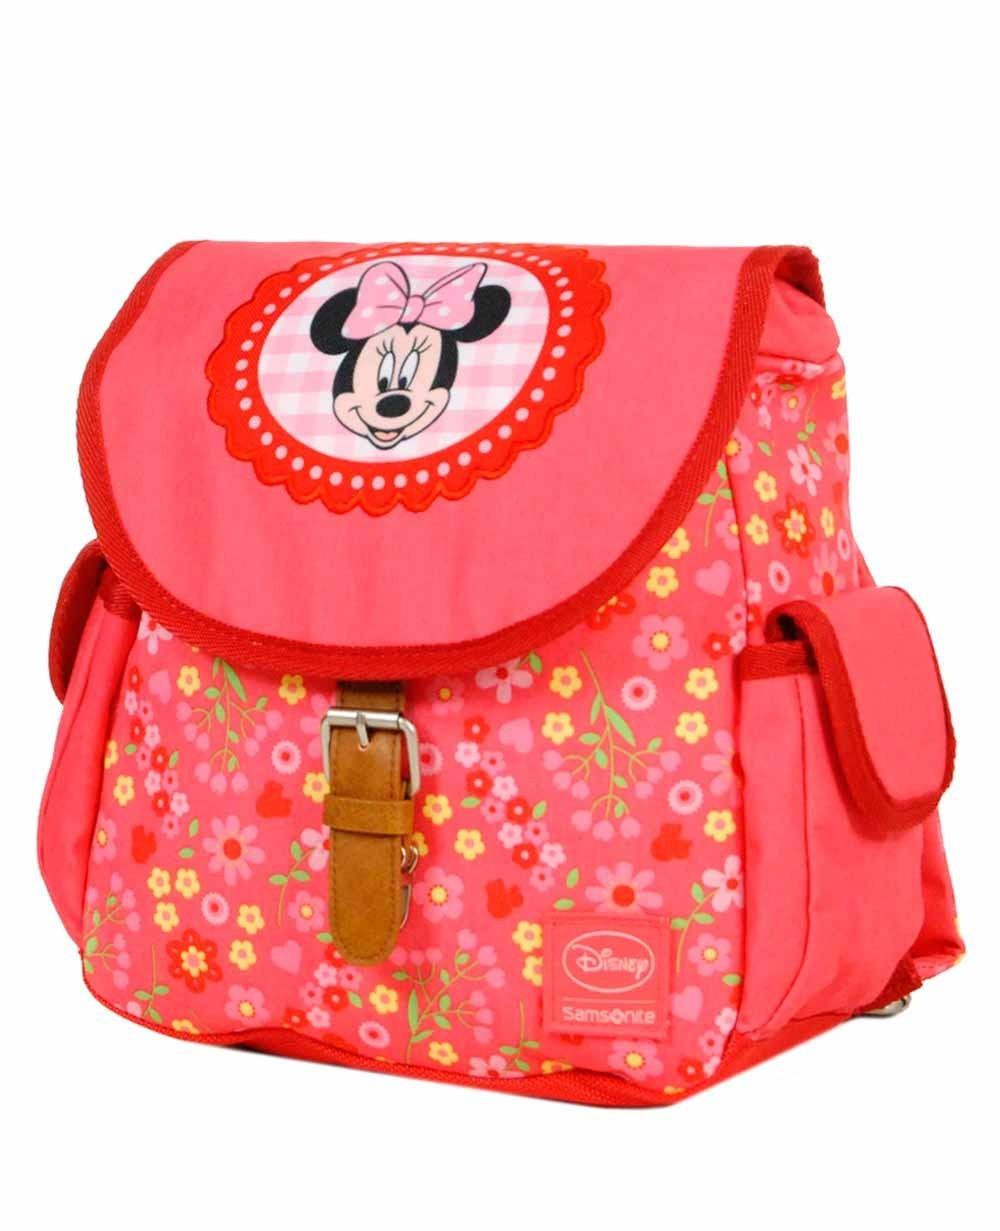 Samsonite Disney Stylies Minnie Mochila S preescolar Rosa (Foto )